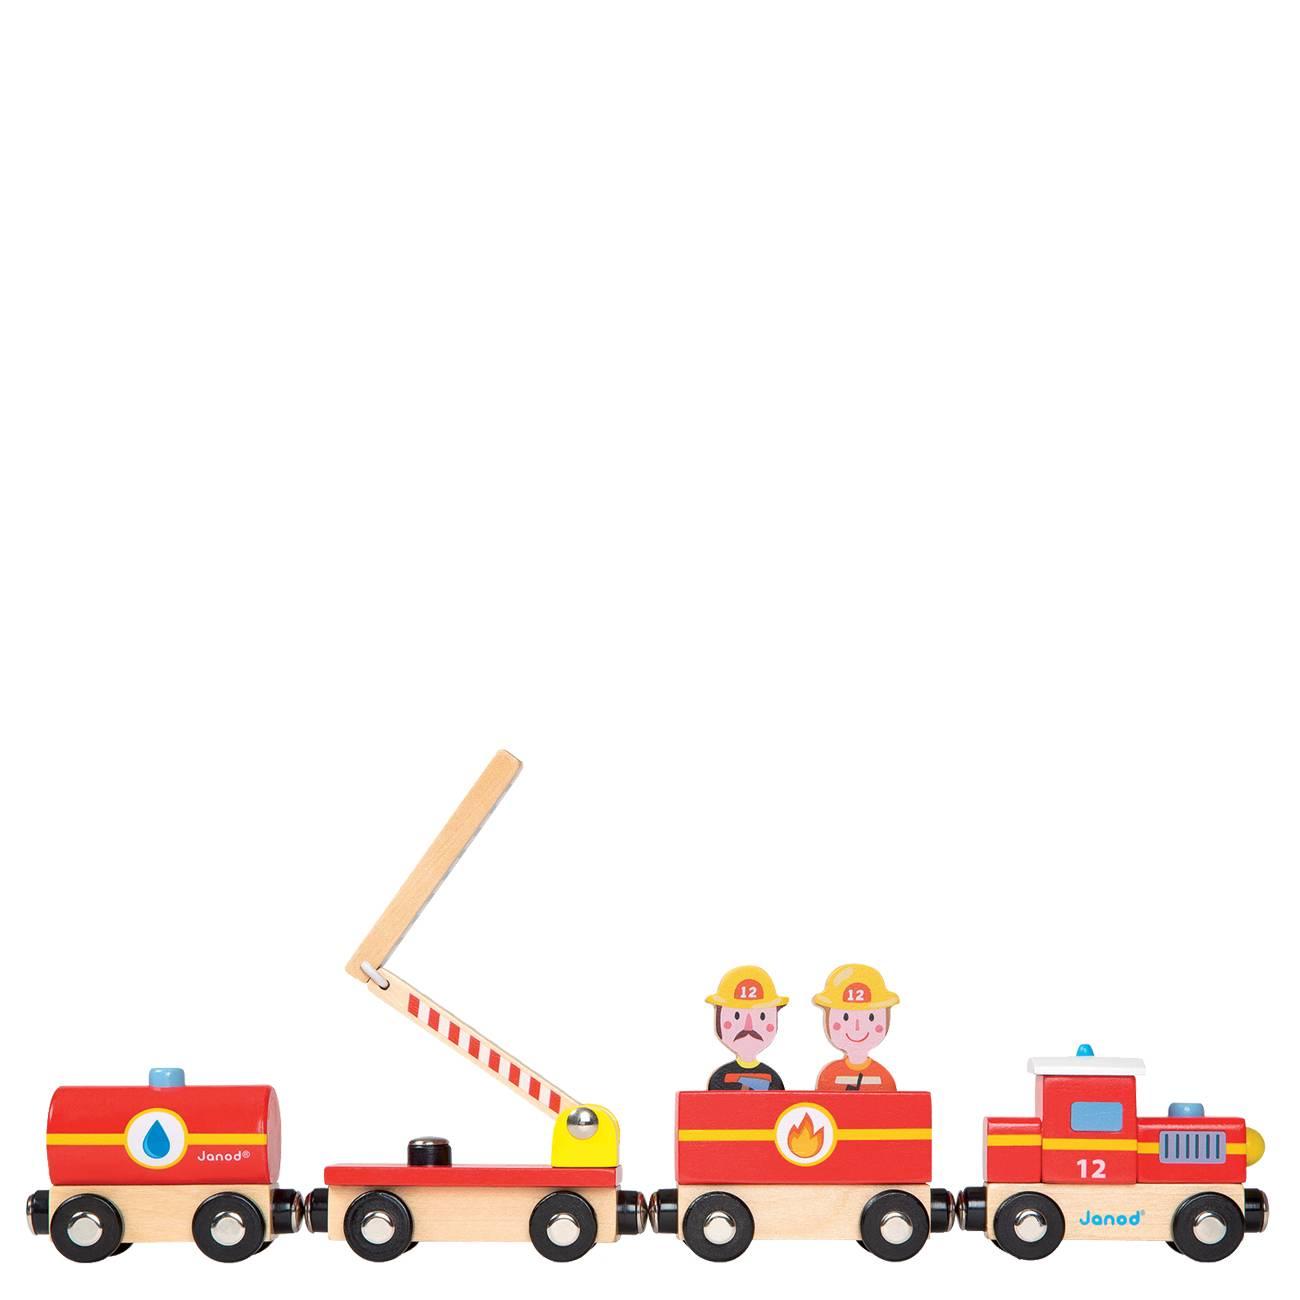 FIREFIGHTER TRAIN